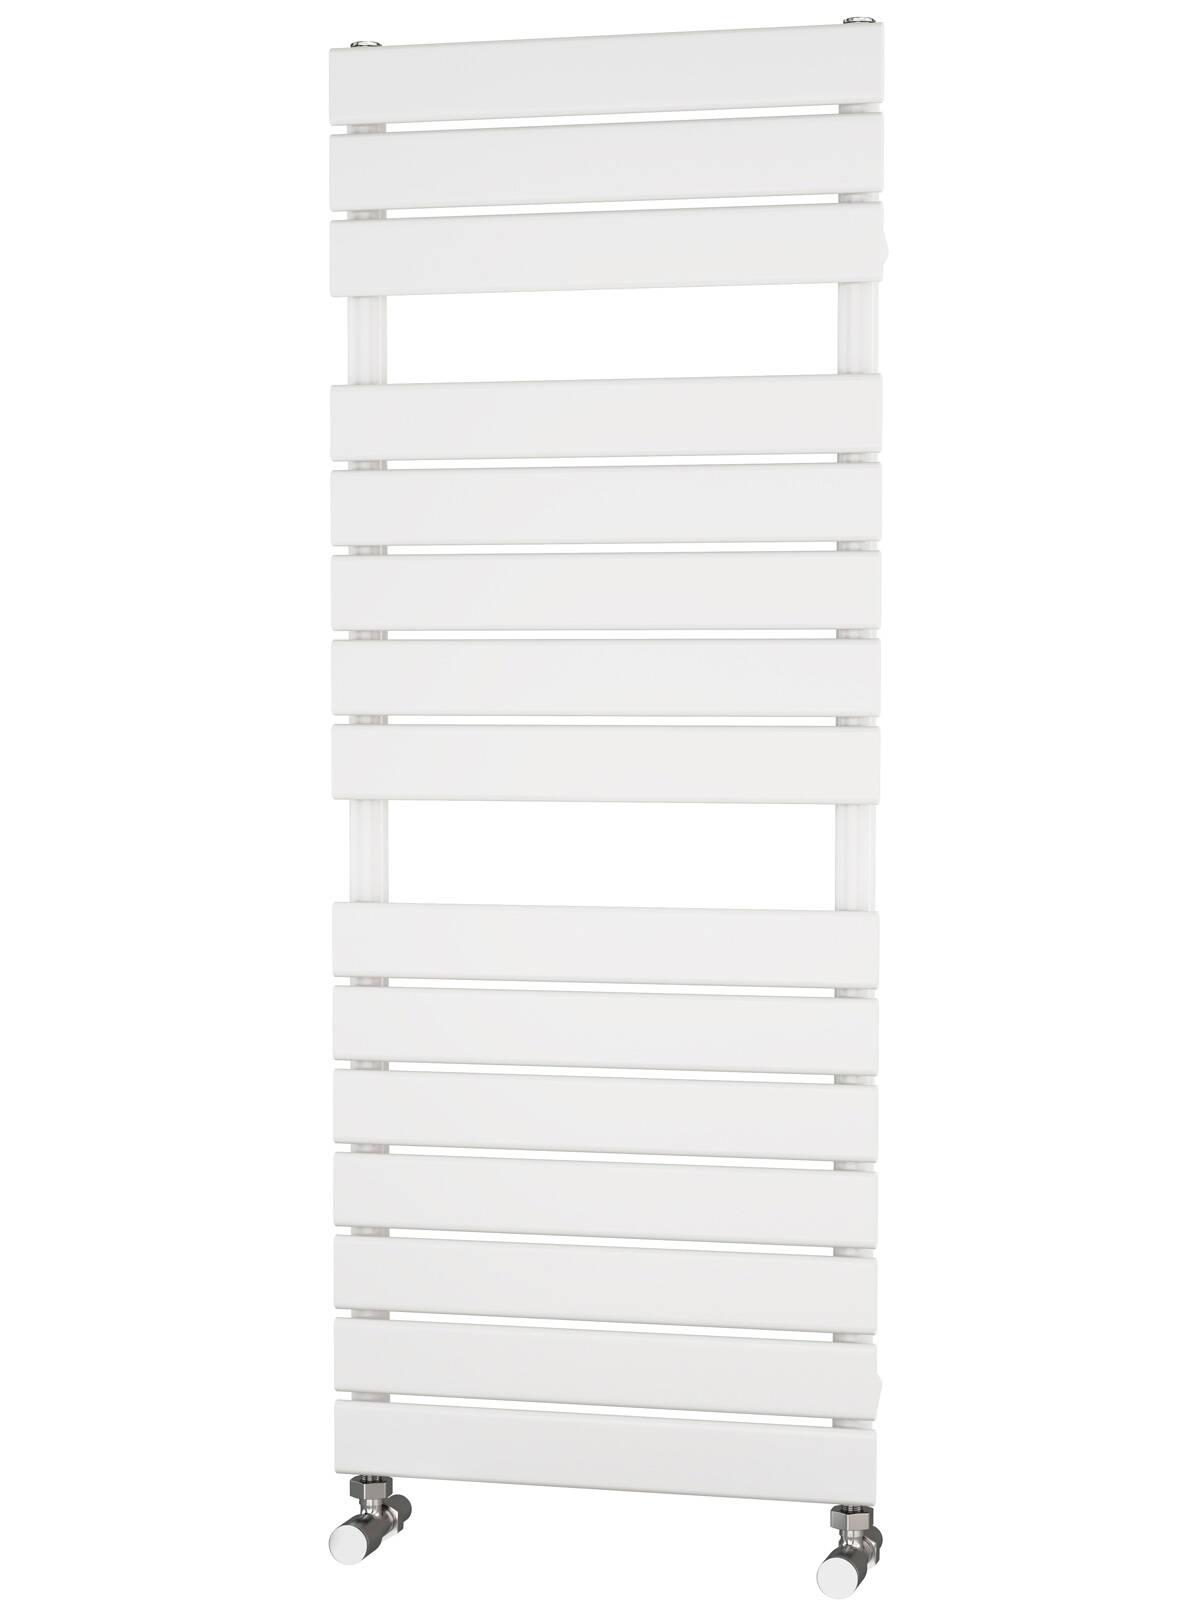 Liso Heated Towel Rails | White Flat Tube Designer 1290 x 500